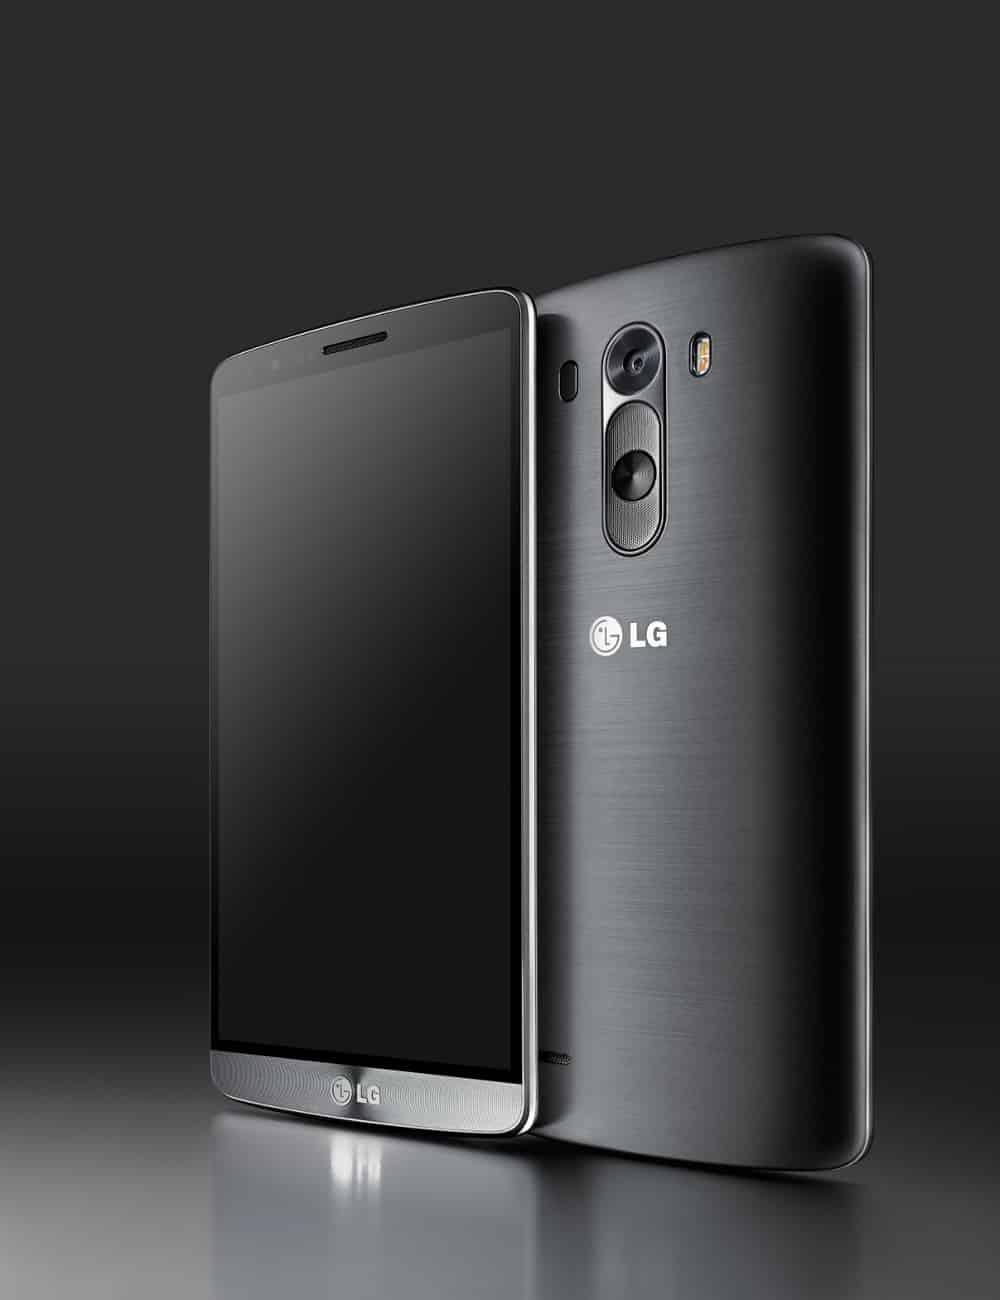 AH LG G3 1.5